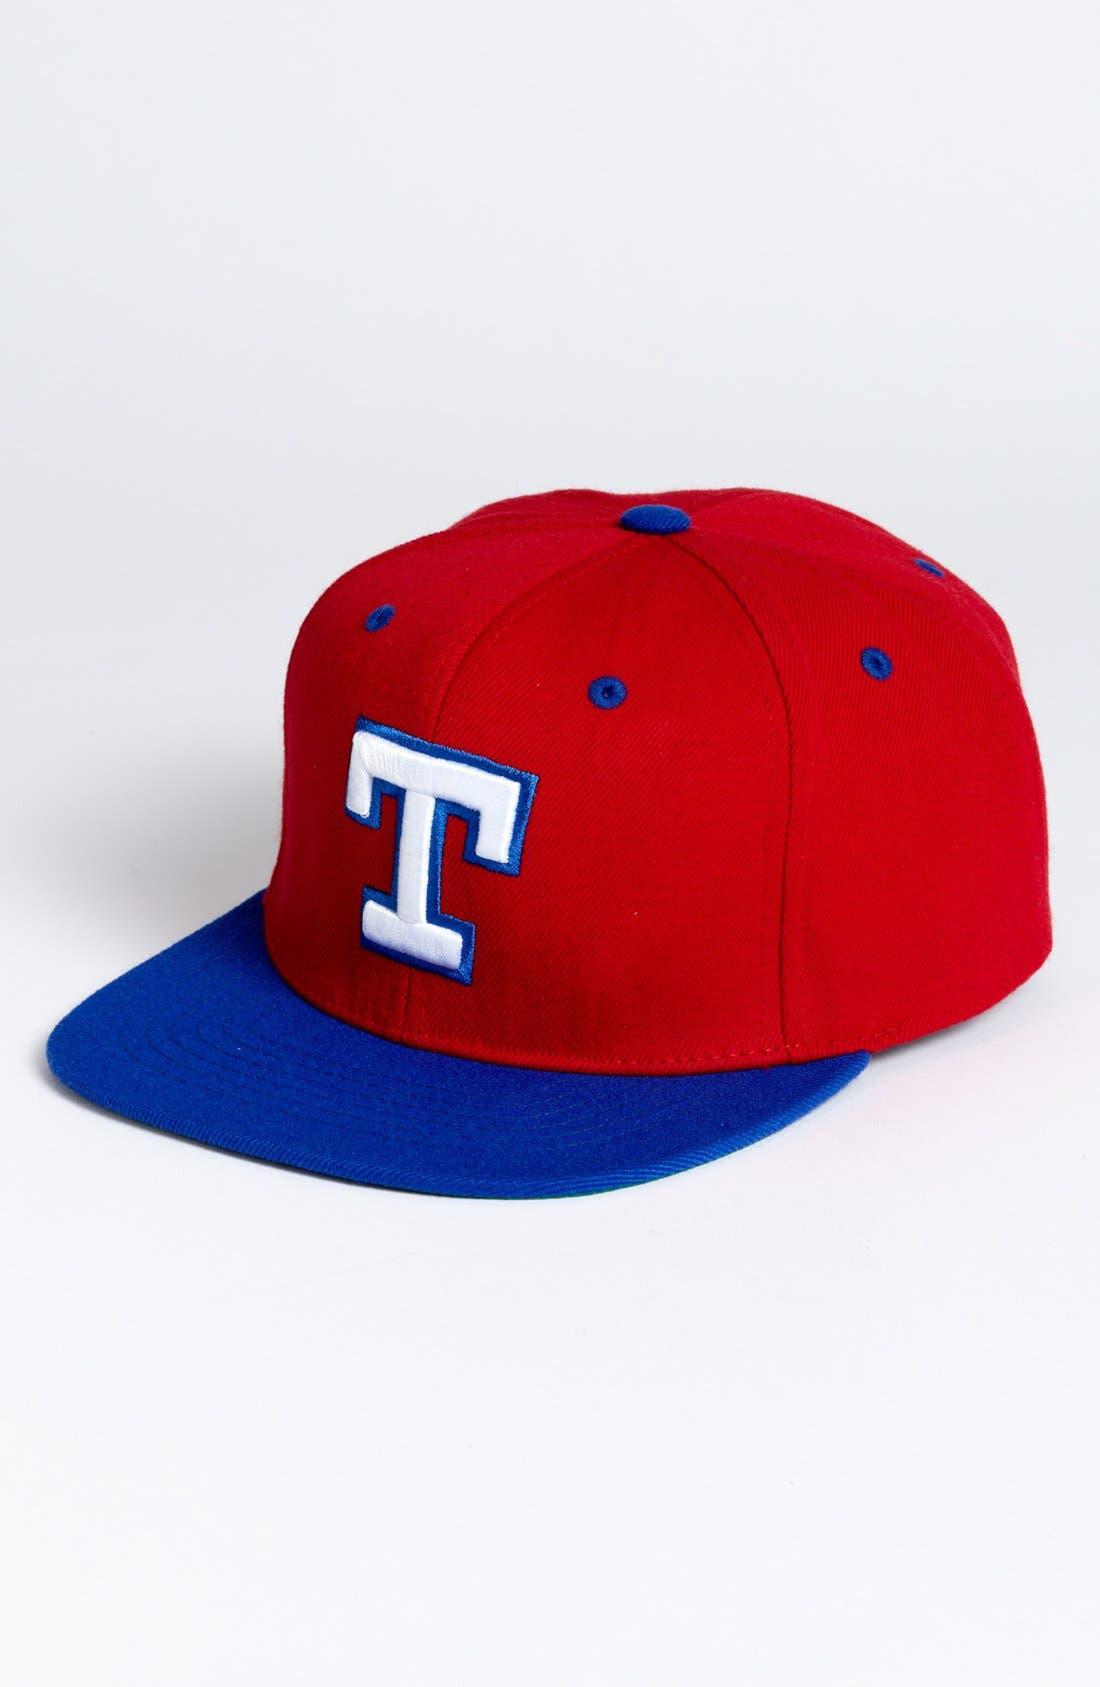 Main Image - American Needle 'Texas Rangers - Back 2 Front' Snapback Baseball Cap